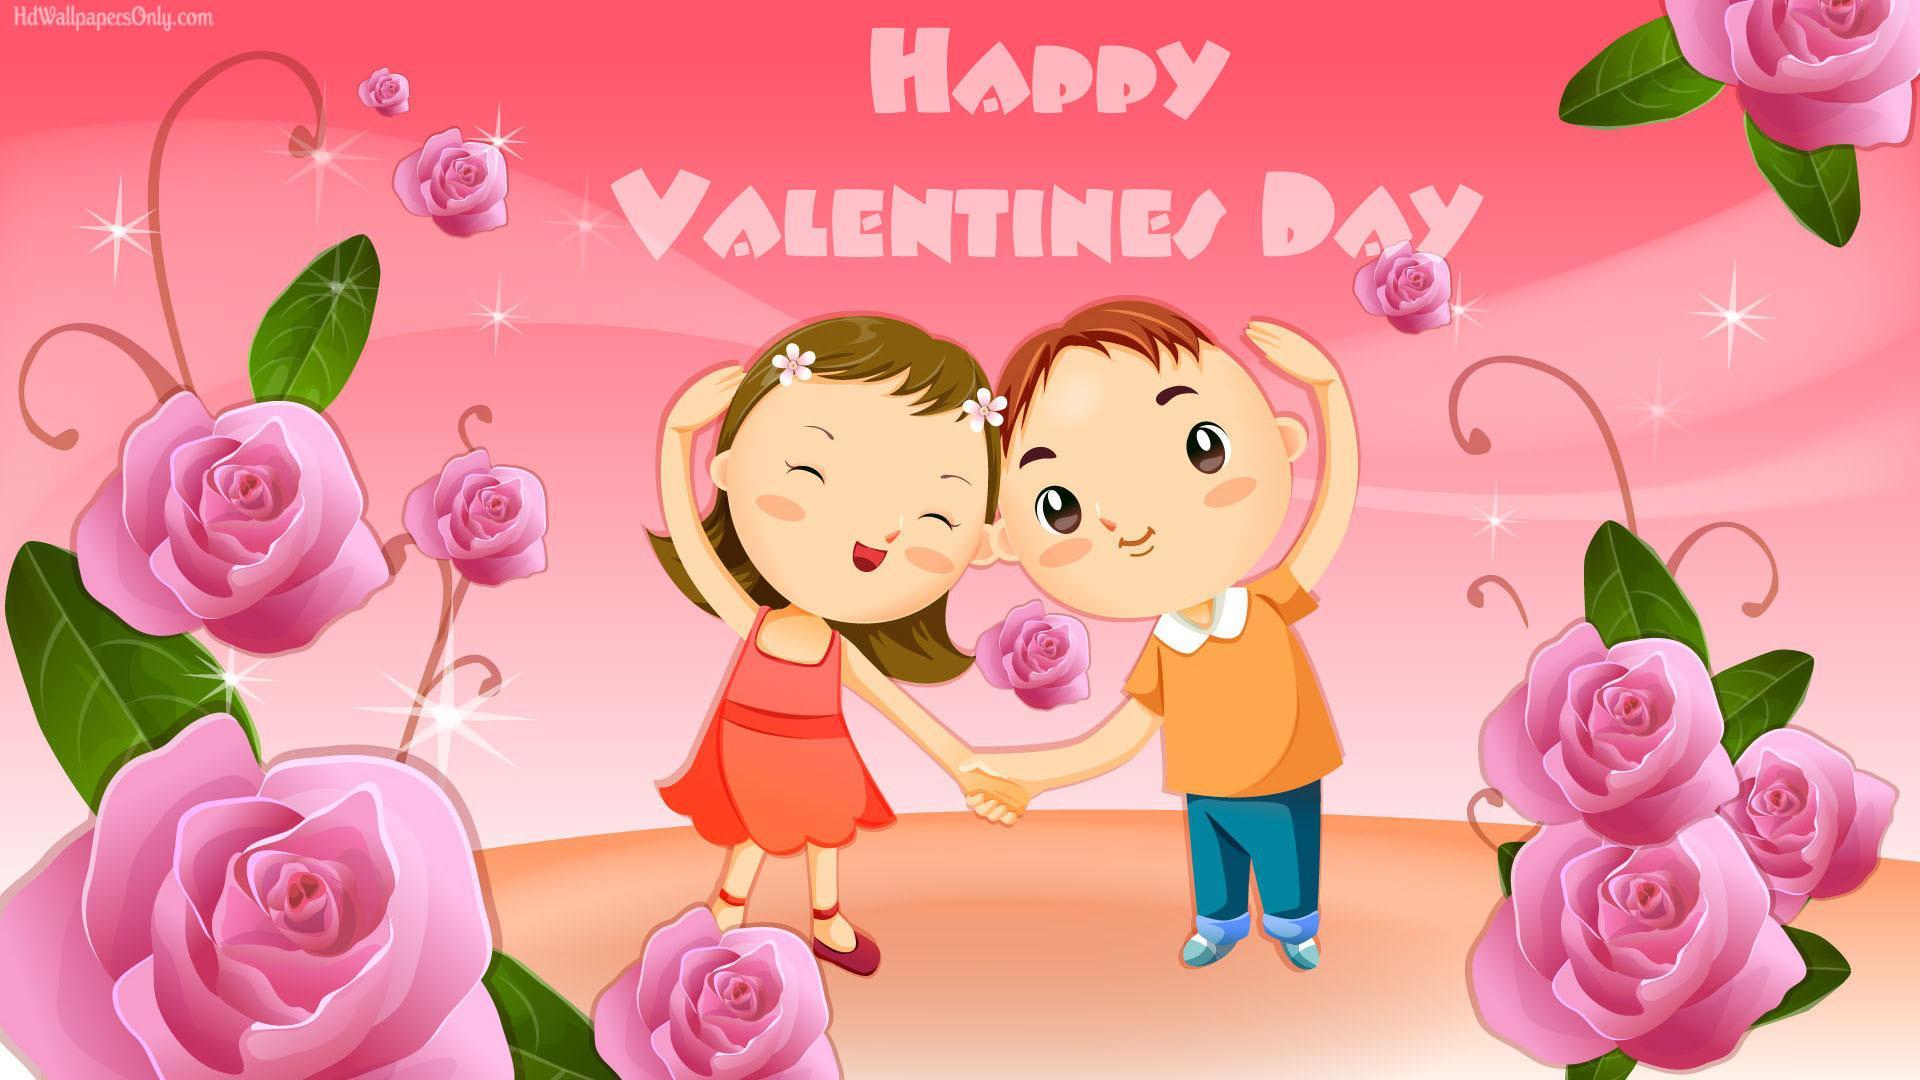 1920x1080 Cute Cartoon Valentine Day 2015 Wallpaper Imag Wallpaper